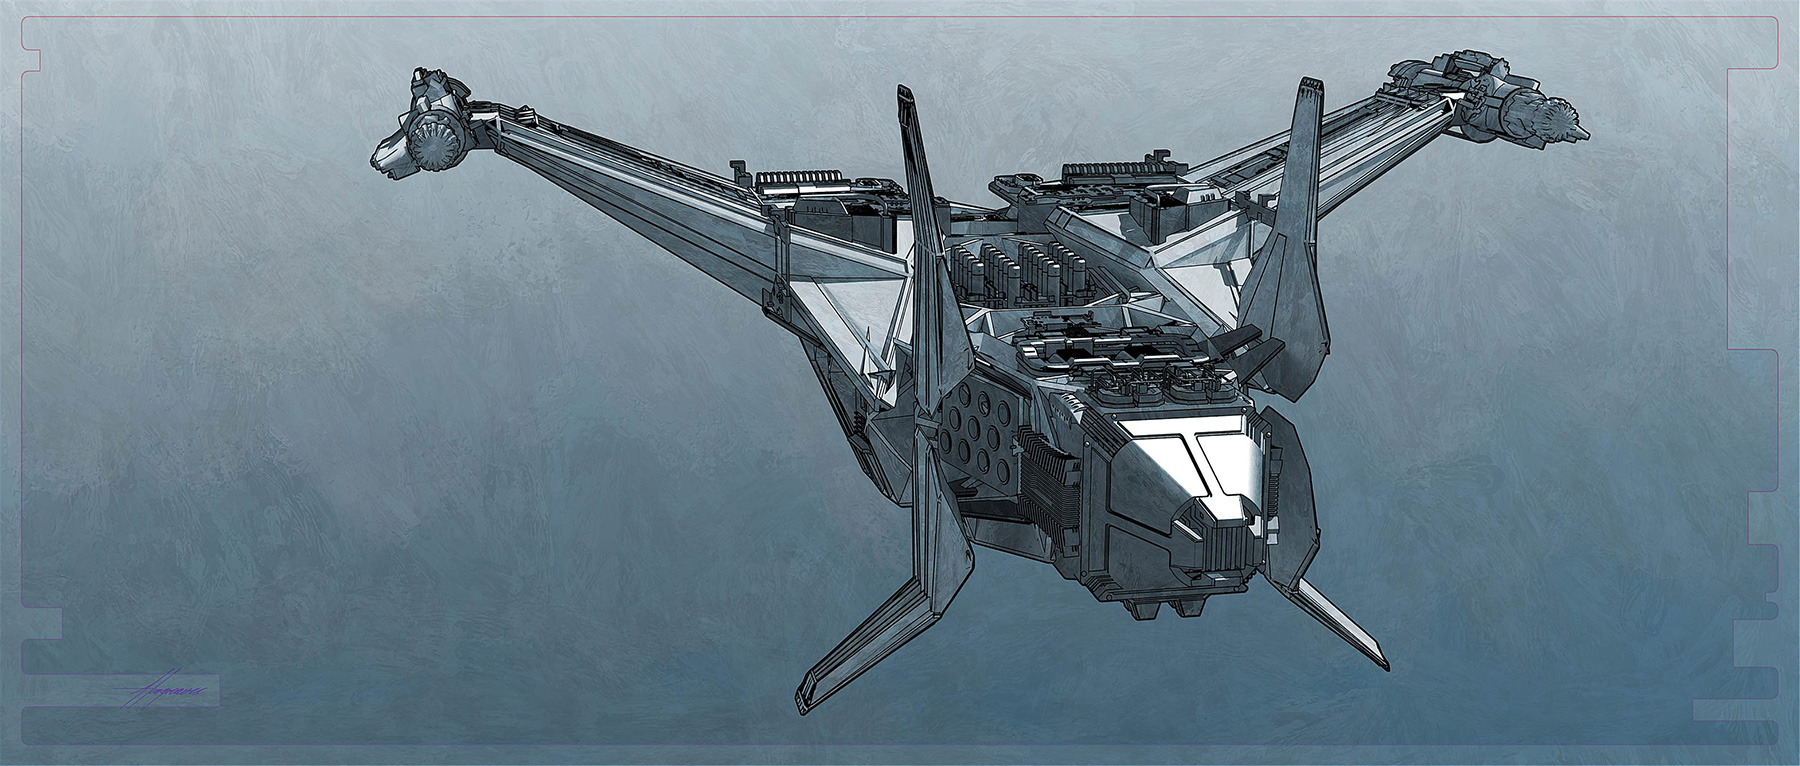 Thor-Ragnarok-Gladiator-Thor-Concept-Art-Sean-Hargreaves-Kingswood-Spaceship-02.jpg